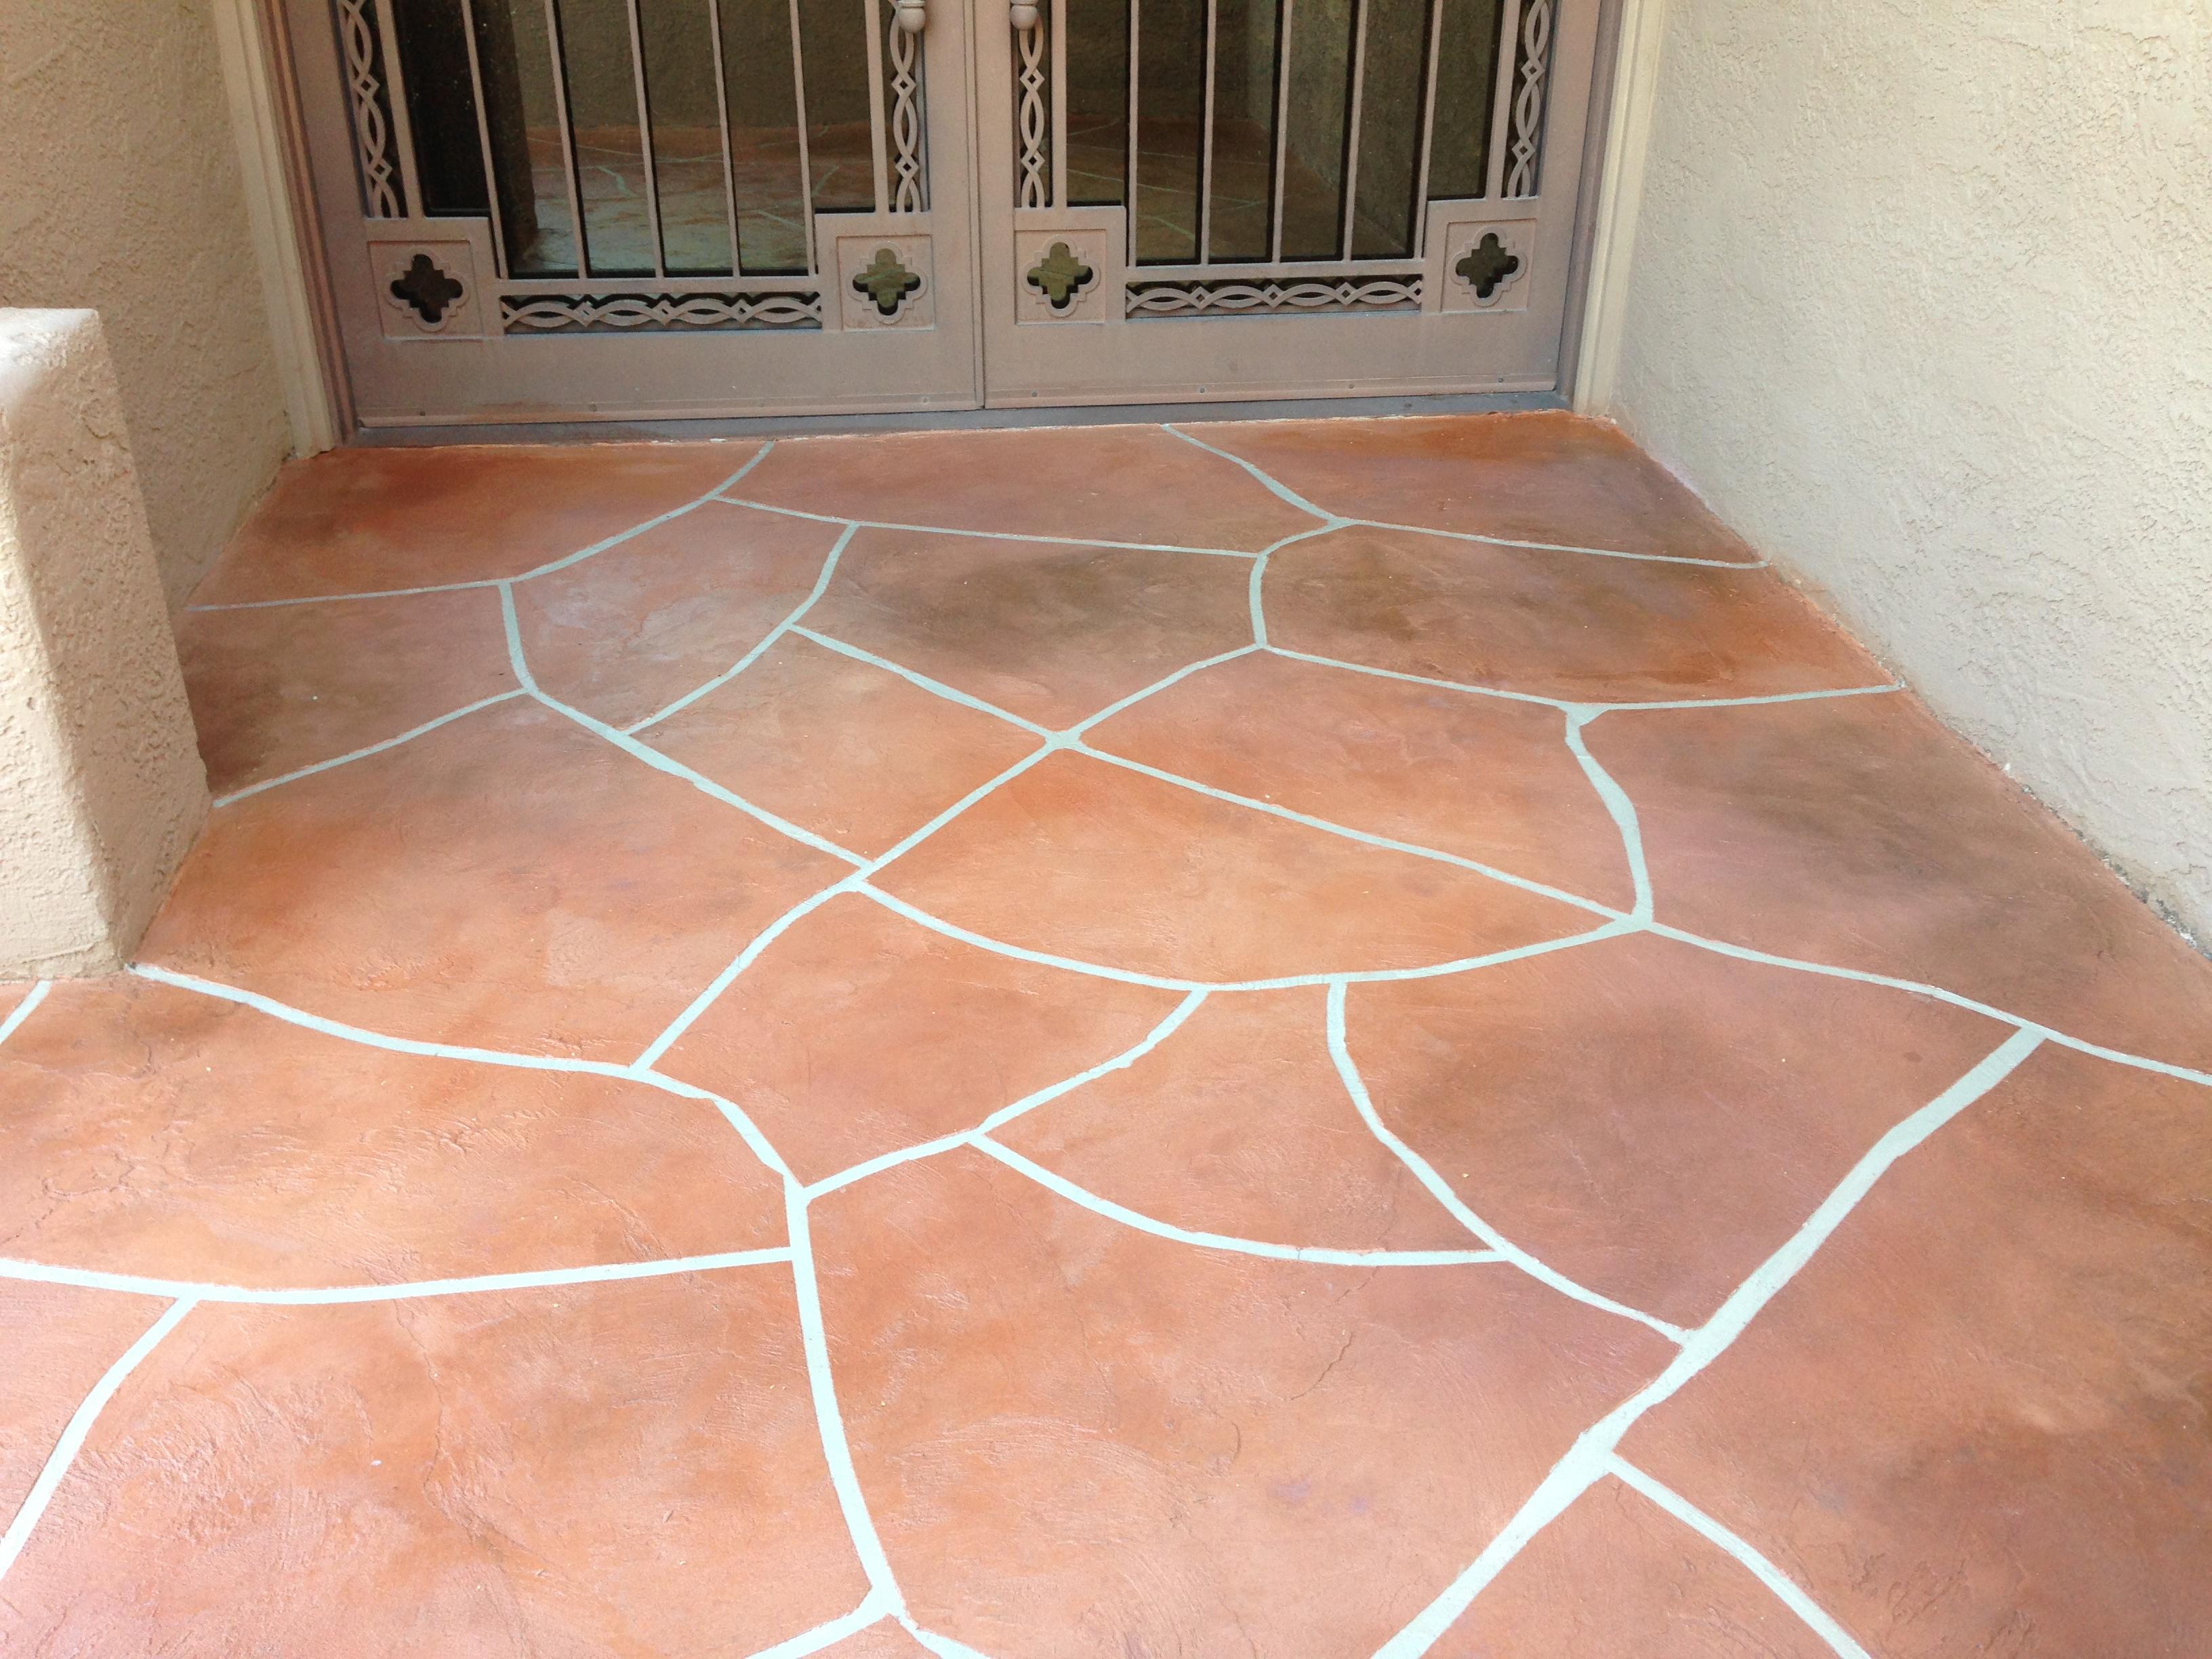 Decorative Concrete Overlay Tucson Concrete Finishes Decorative Concrete Flooring Overlays